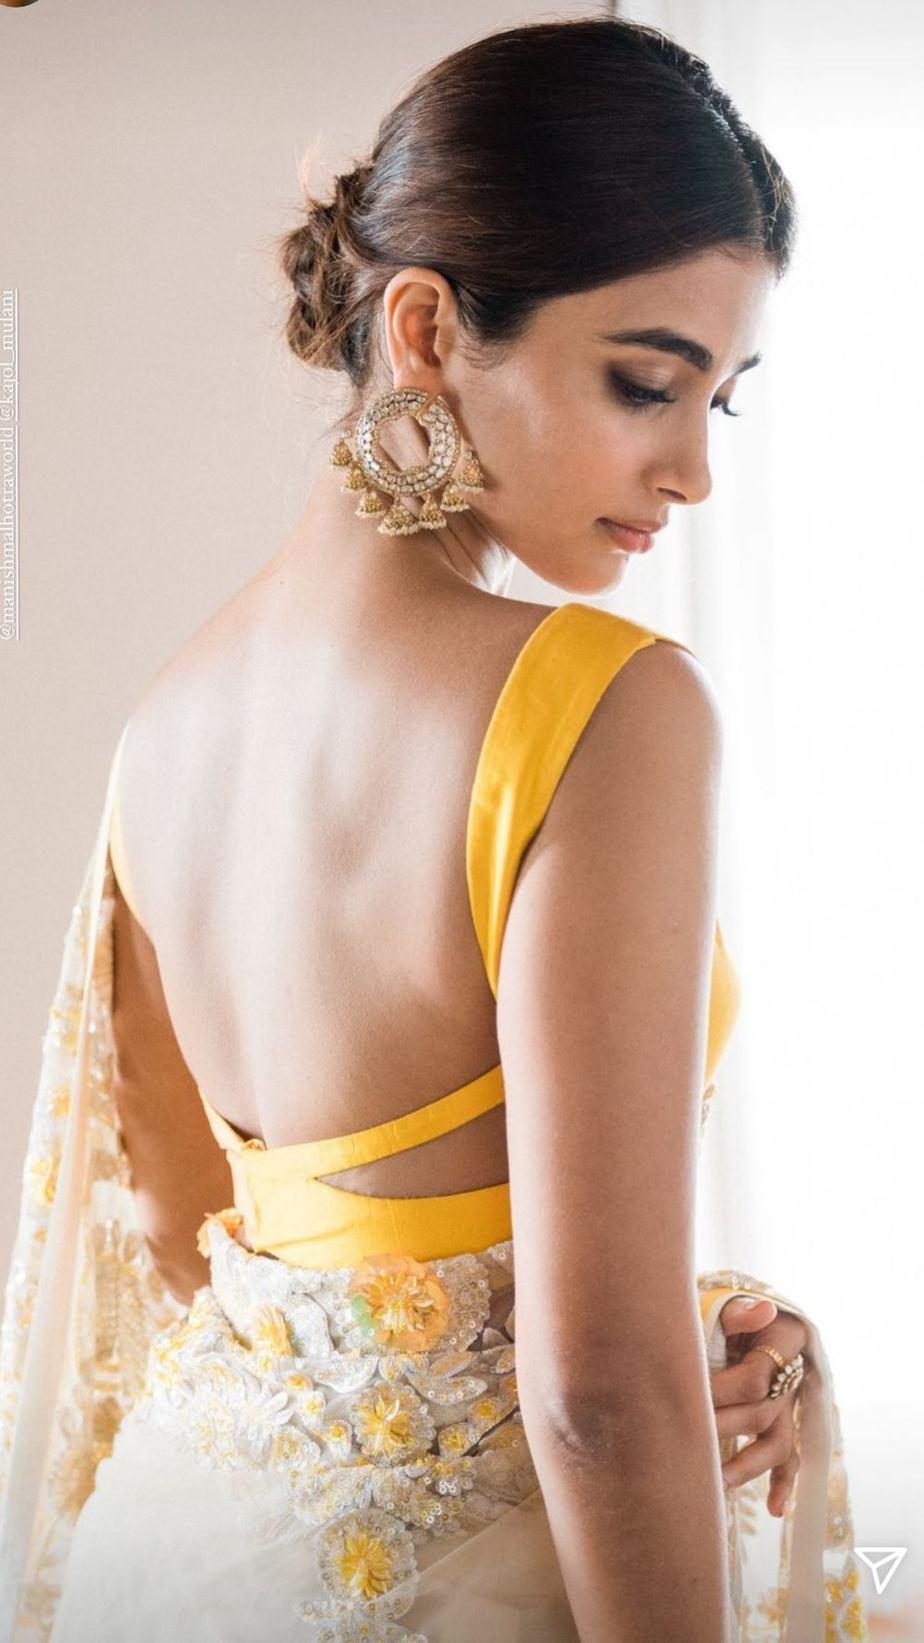 Pooja Hegde in a manish malhotra saree